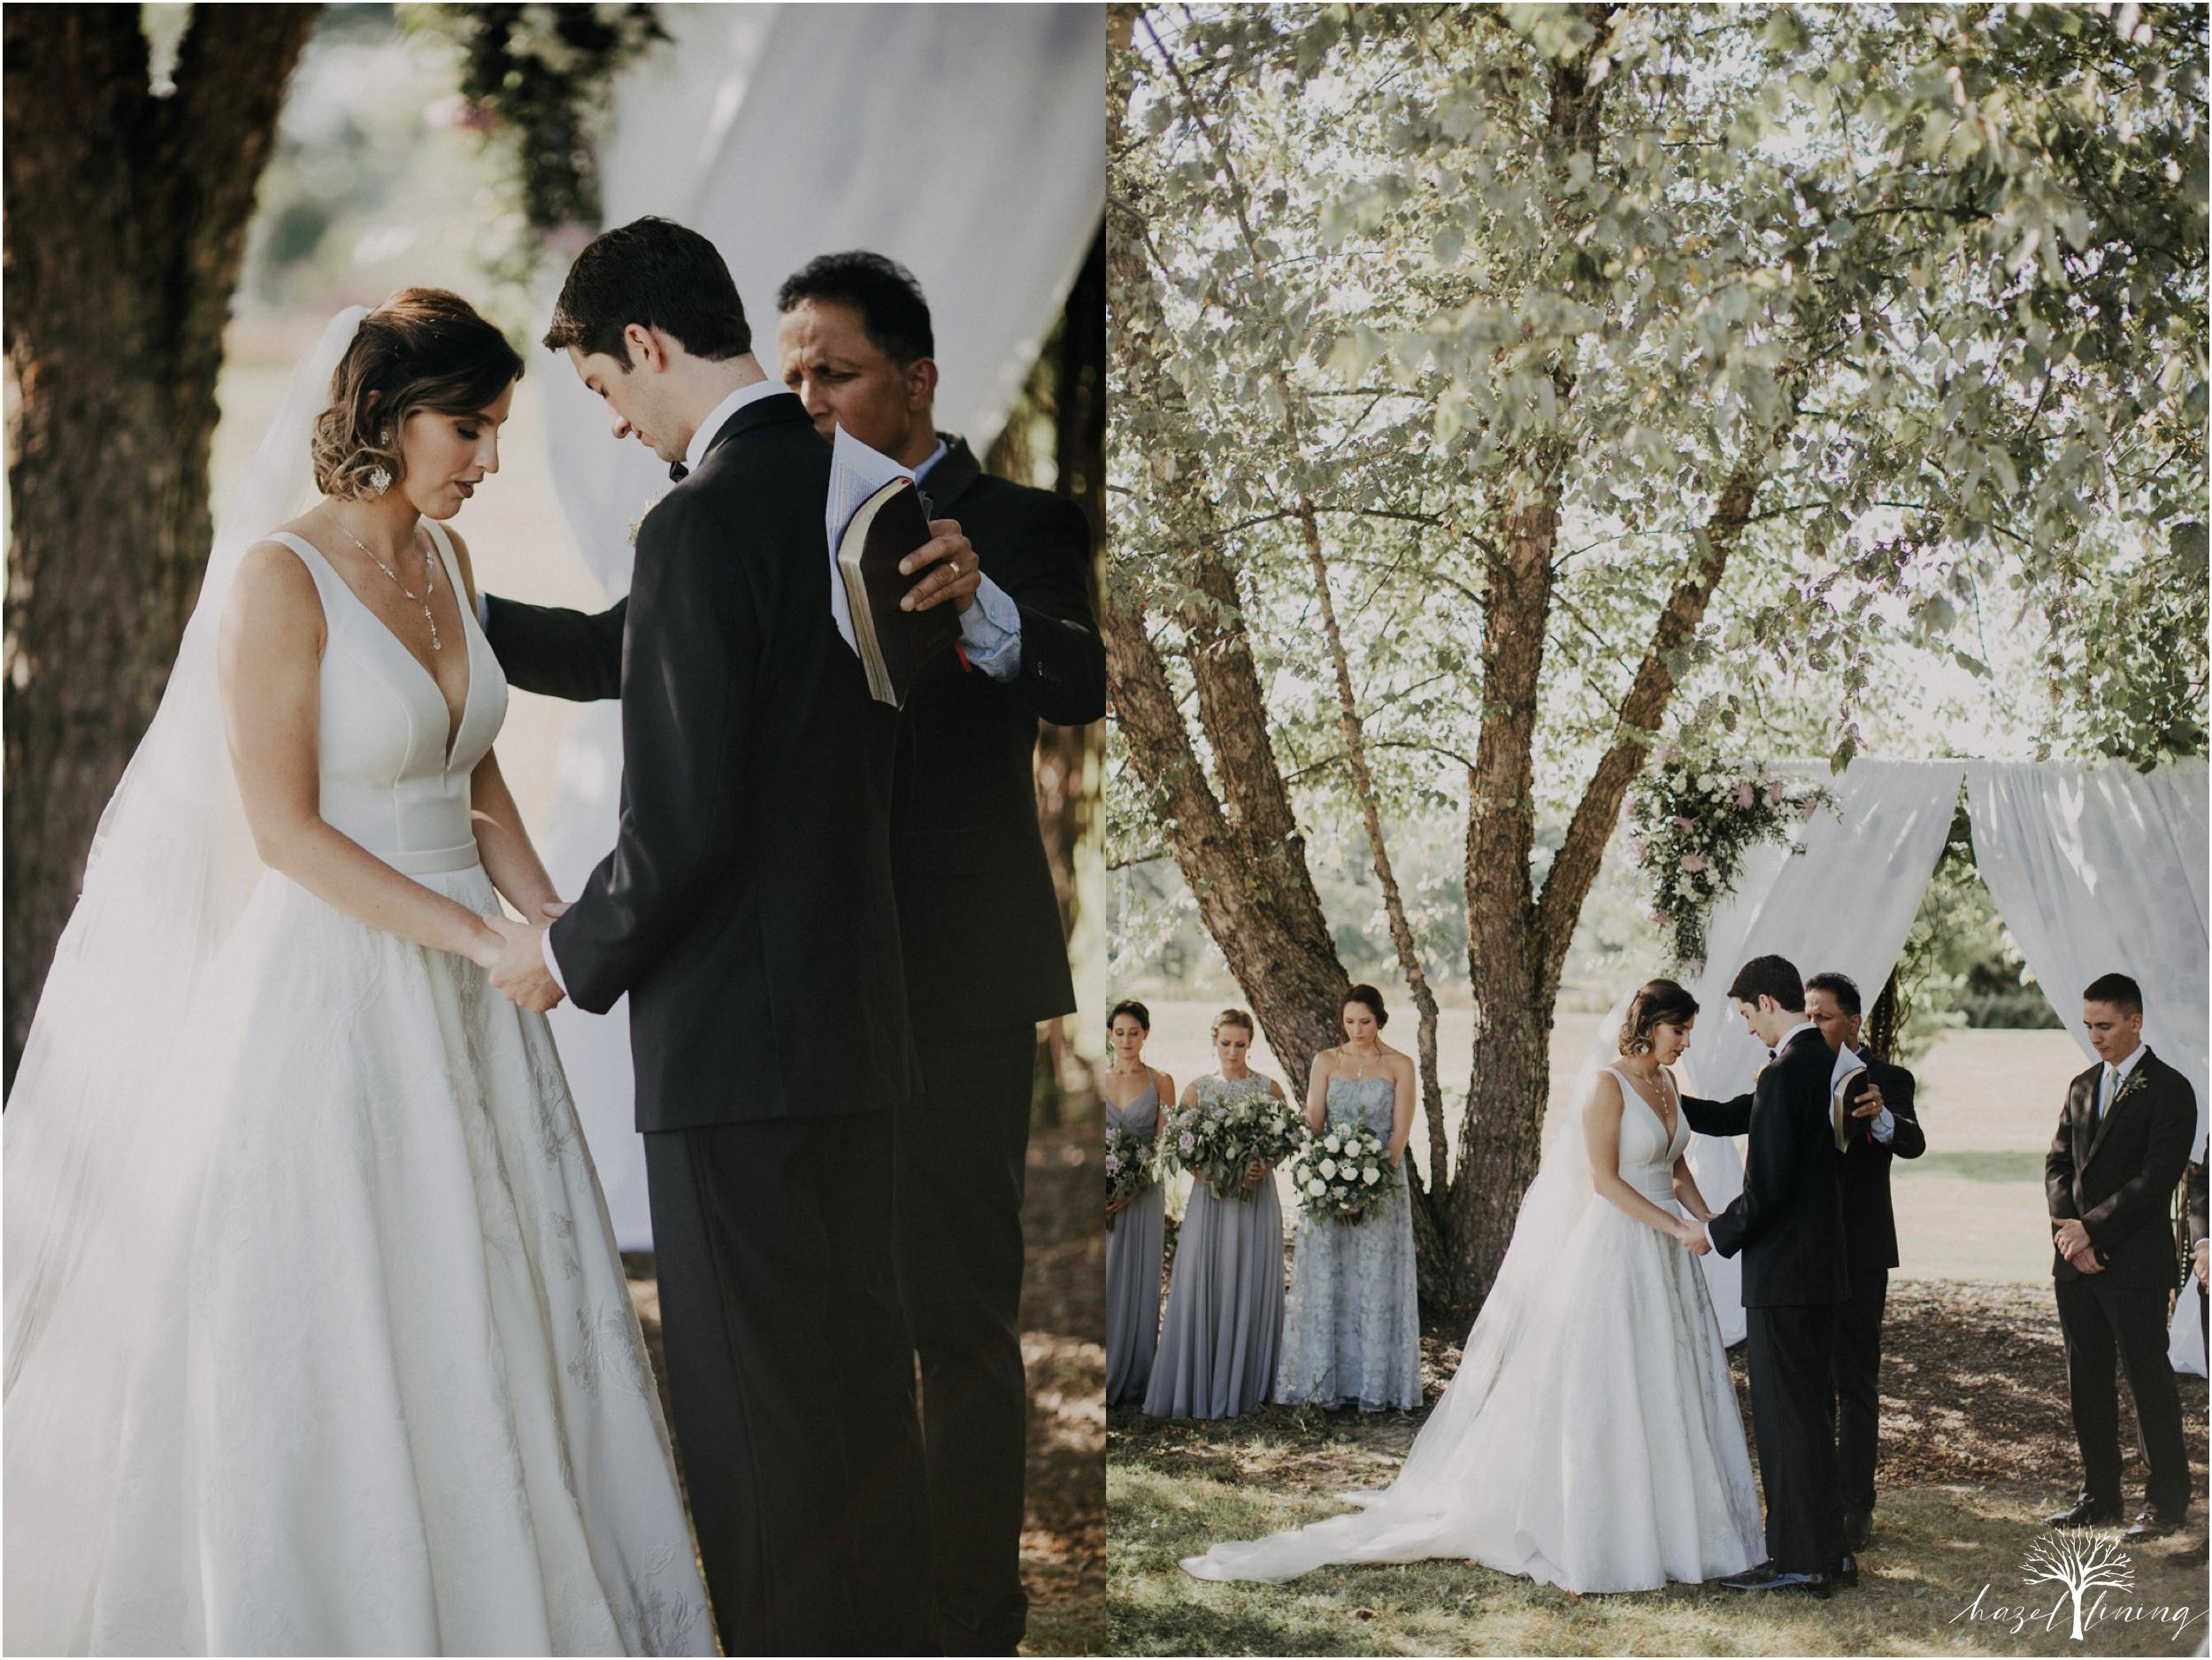 maureen-hepner-anthony-giordano-rose-bank-winery-newtow-pennsylvania-luxury-summer-wedding-hazel-lining-photography-destination-elopement-wedding-engagement-photography_0073.jpg